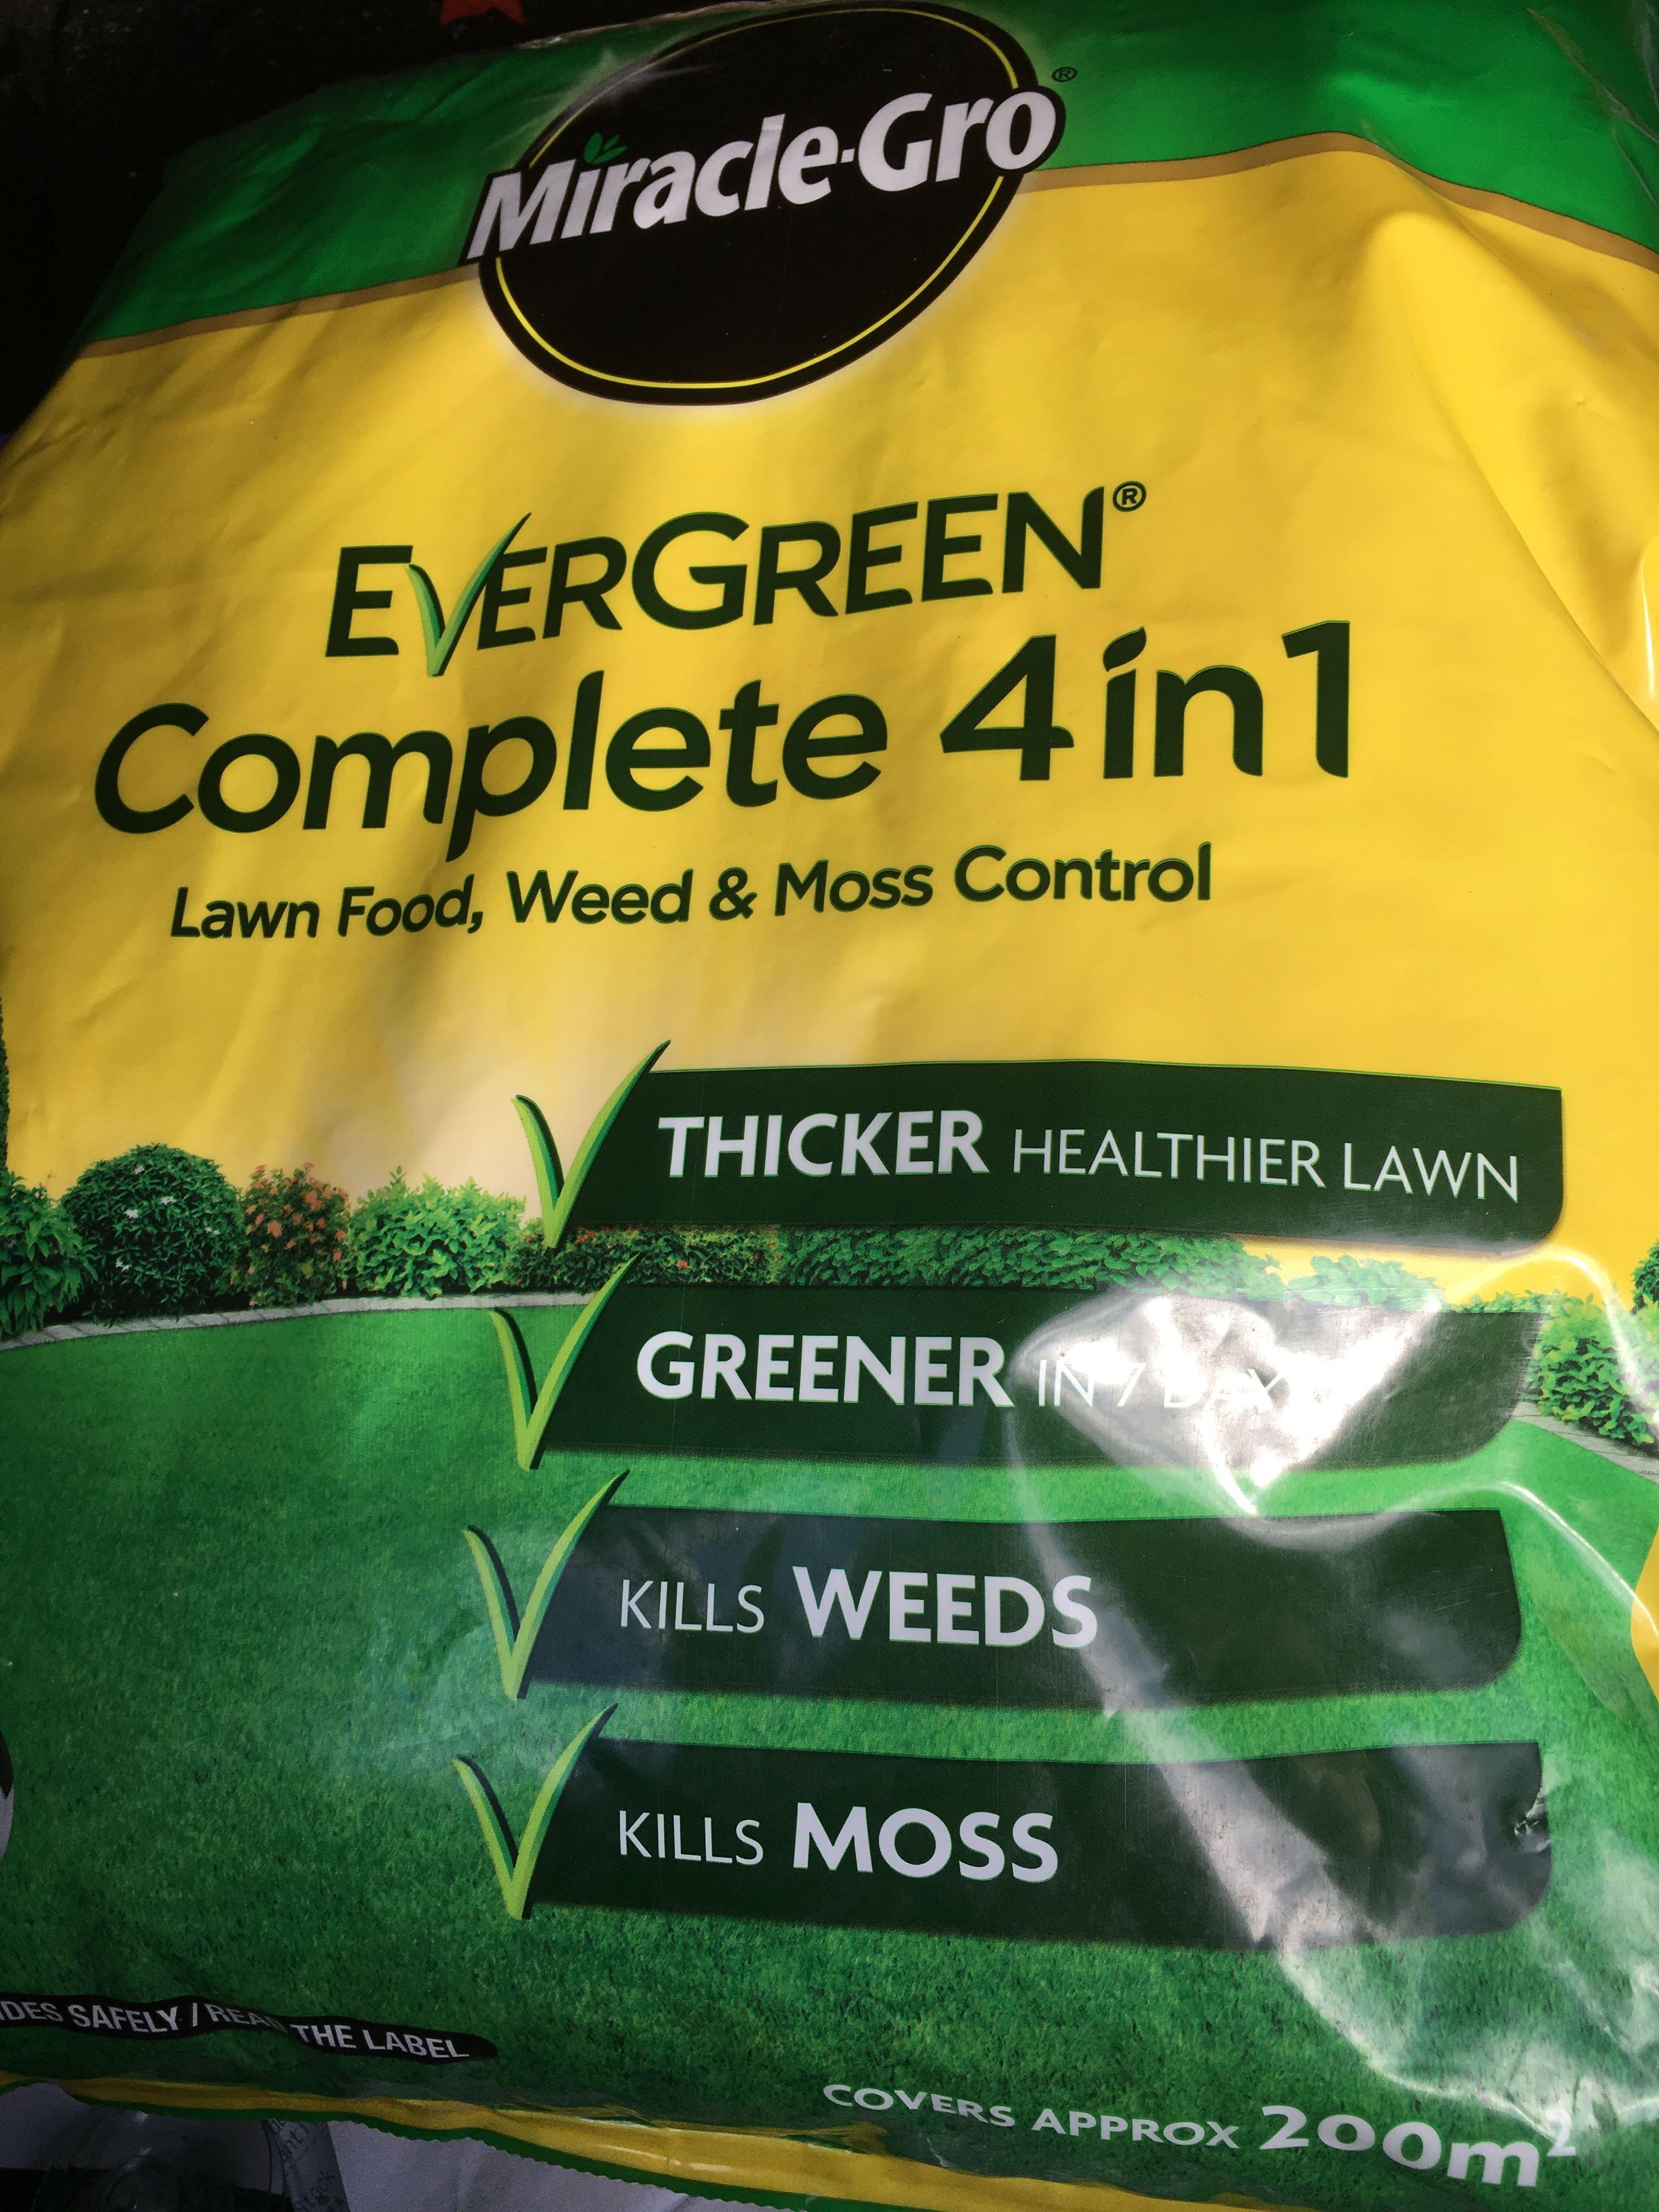 Miracle Gro Evergreen Complete 4 in 1 Lawn Food, Weed & Moss Control £3.25 @ Wilko Milton keynes (Kingston)